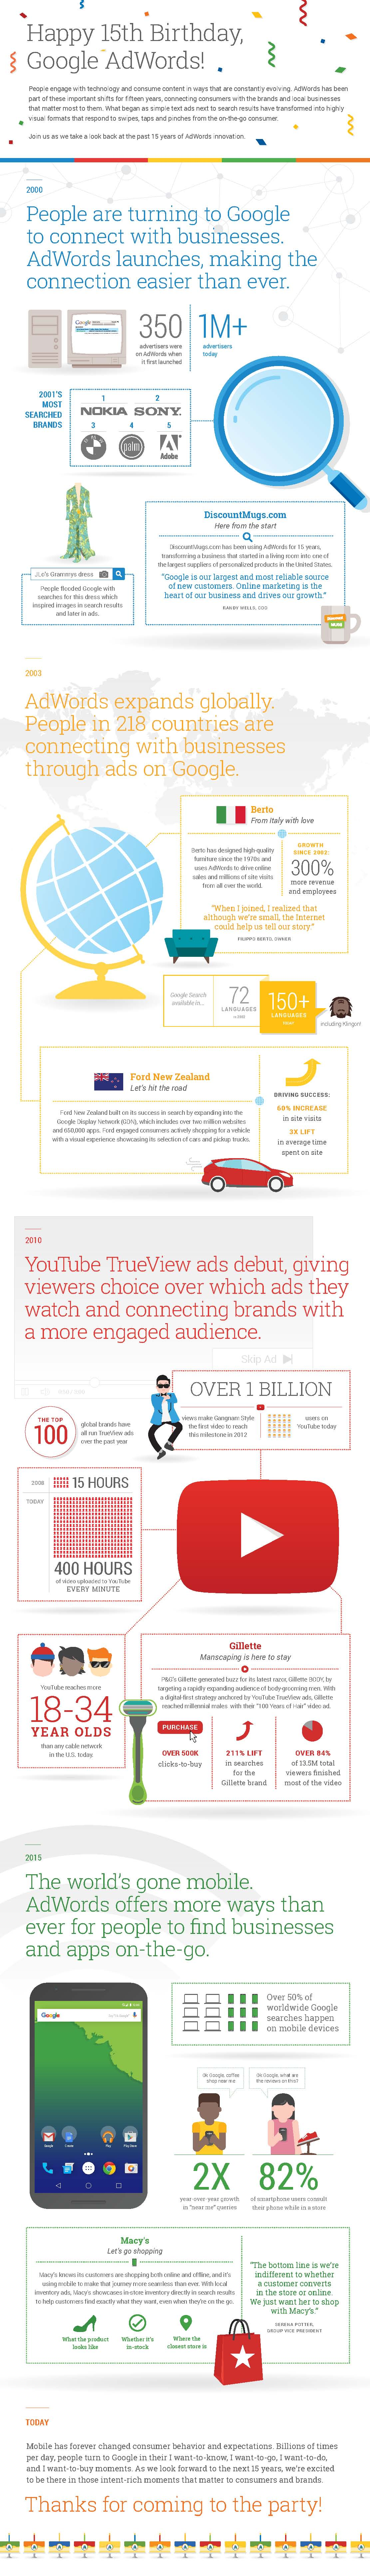 Higgins Marketing Group - 15 IMPRESSIVE Years of Google AdWords (Infographic)